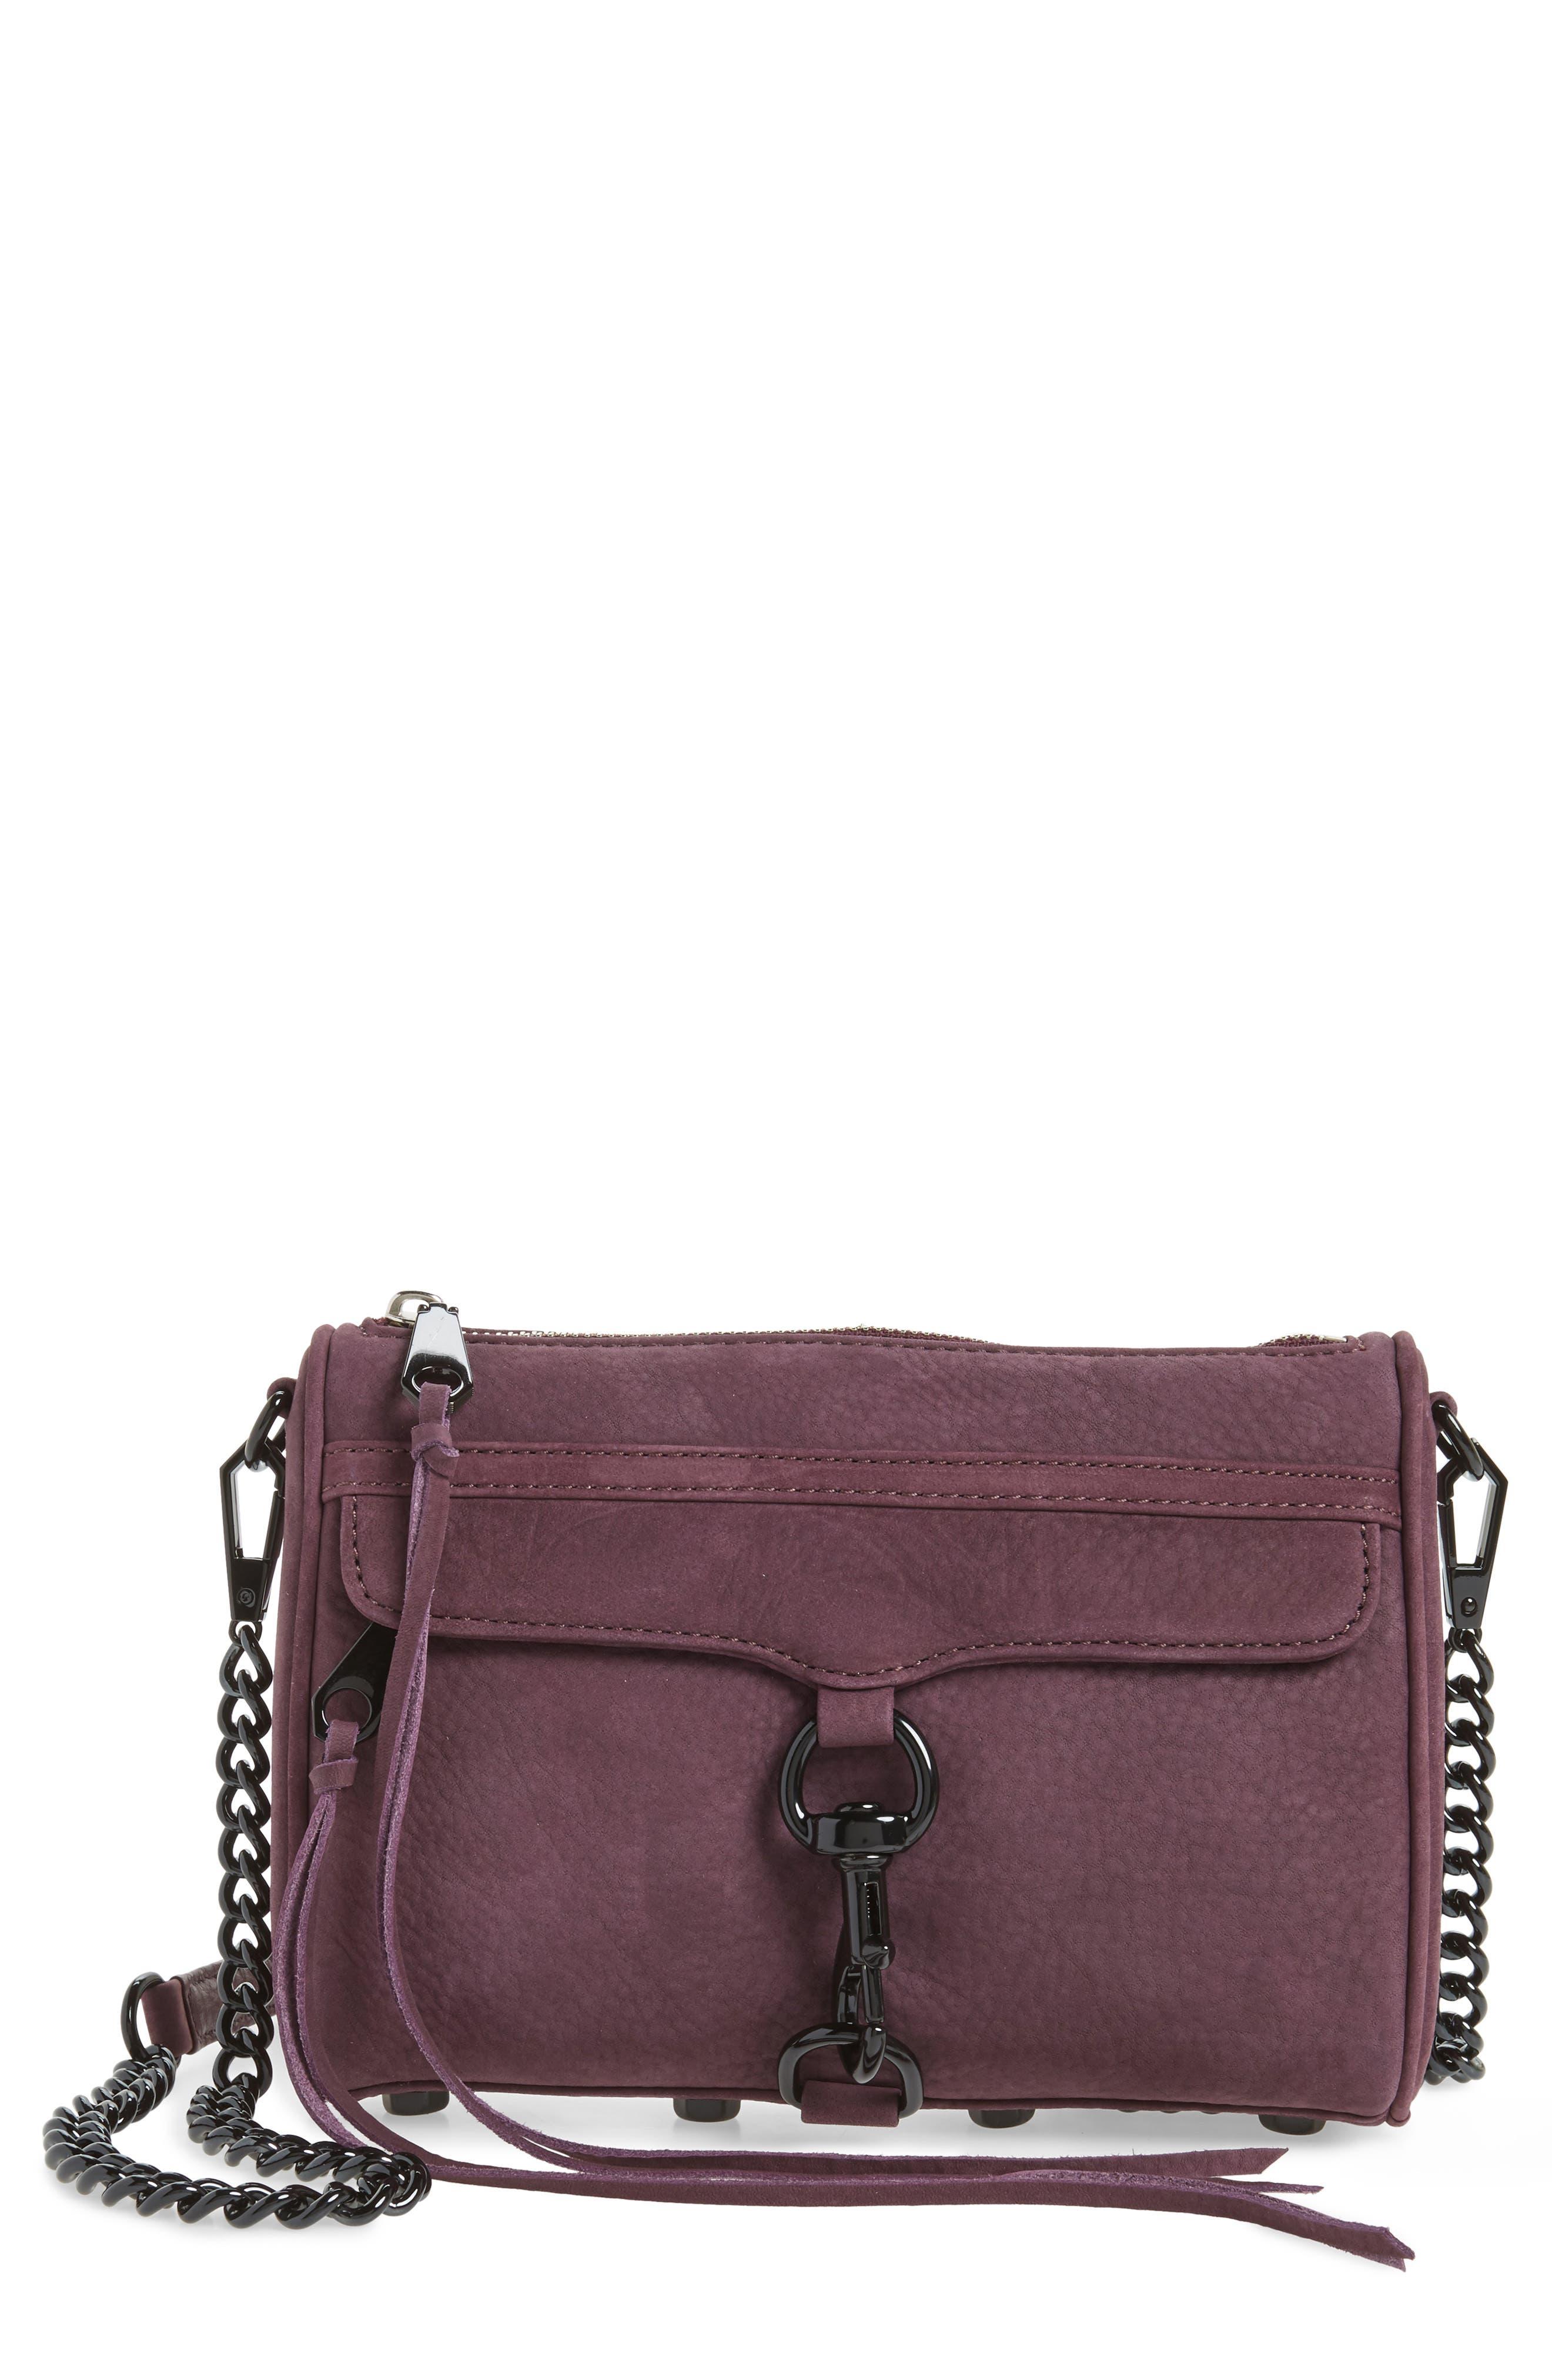 Main Image - Rebecca Minkoff Mini MAC Nubuck Convertible Crossbody Bag